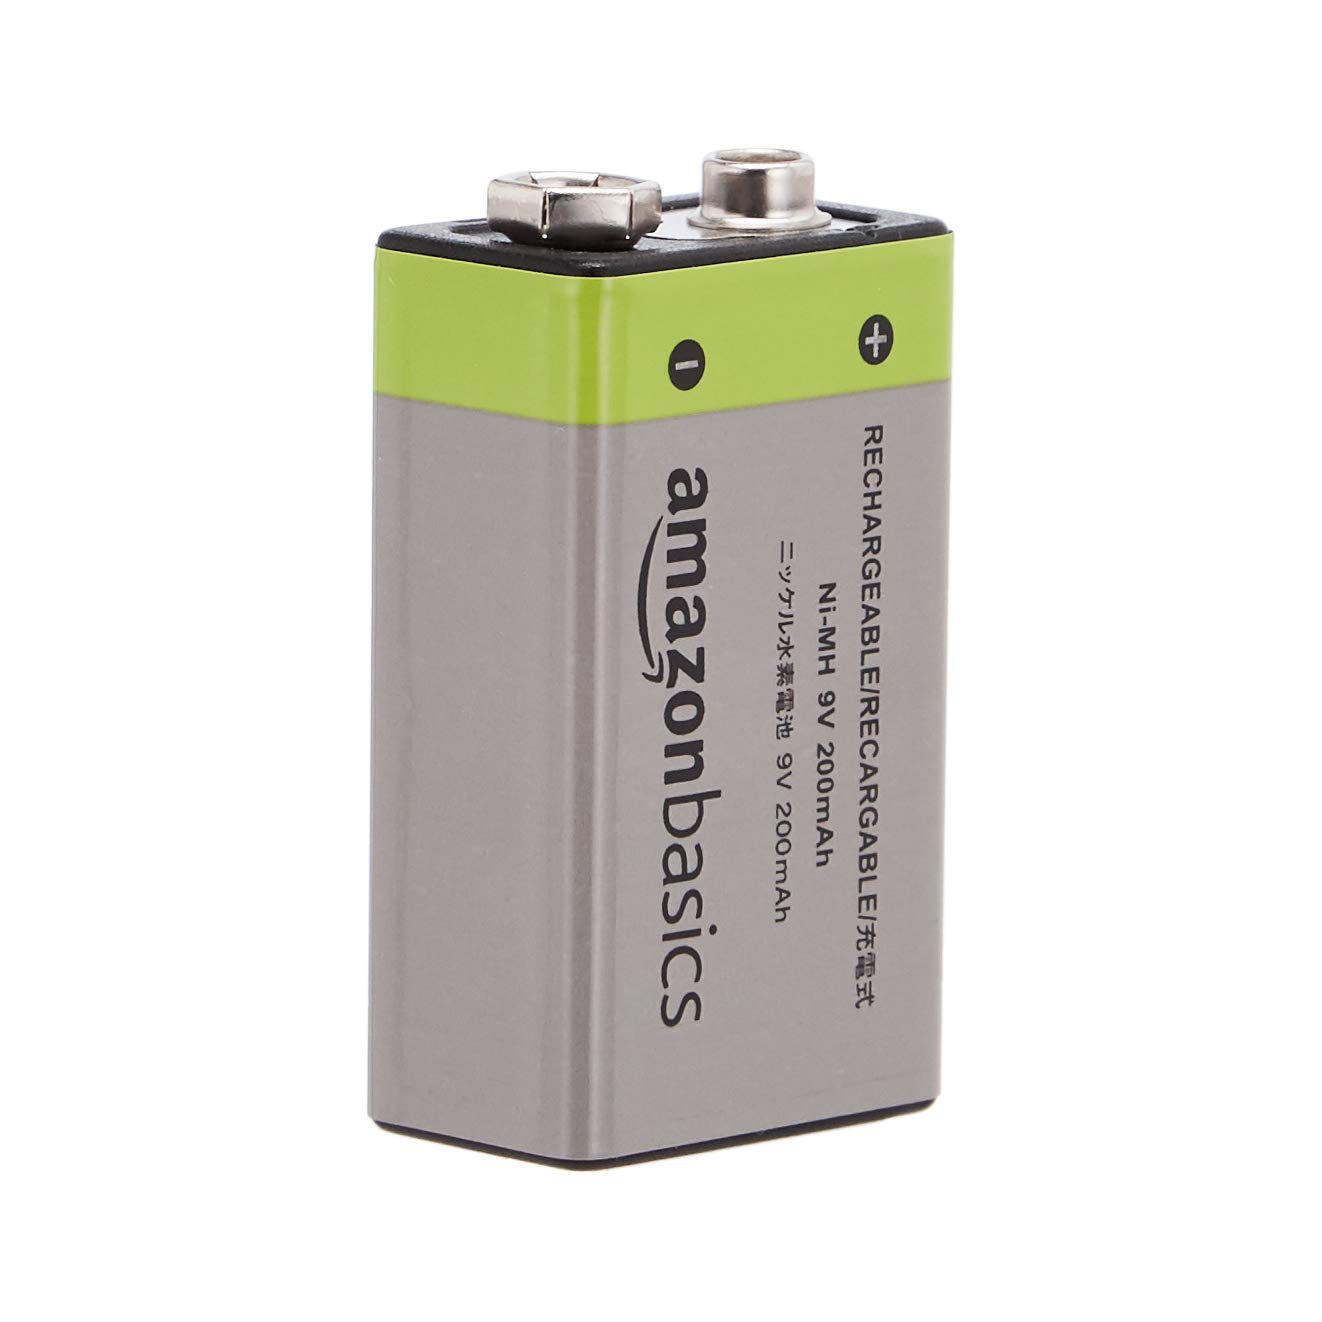 AmazonBasics 9V Cell Rechargeable Batteries 200mAh Ni-MH, 4-Pack by AmazonBasics